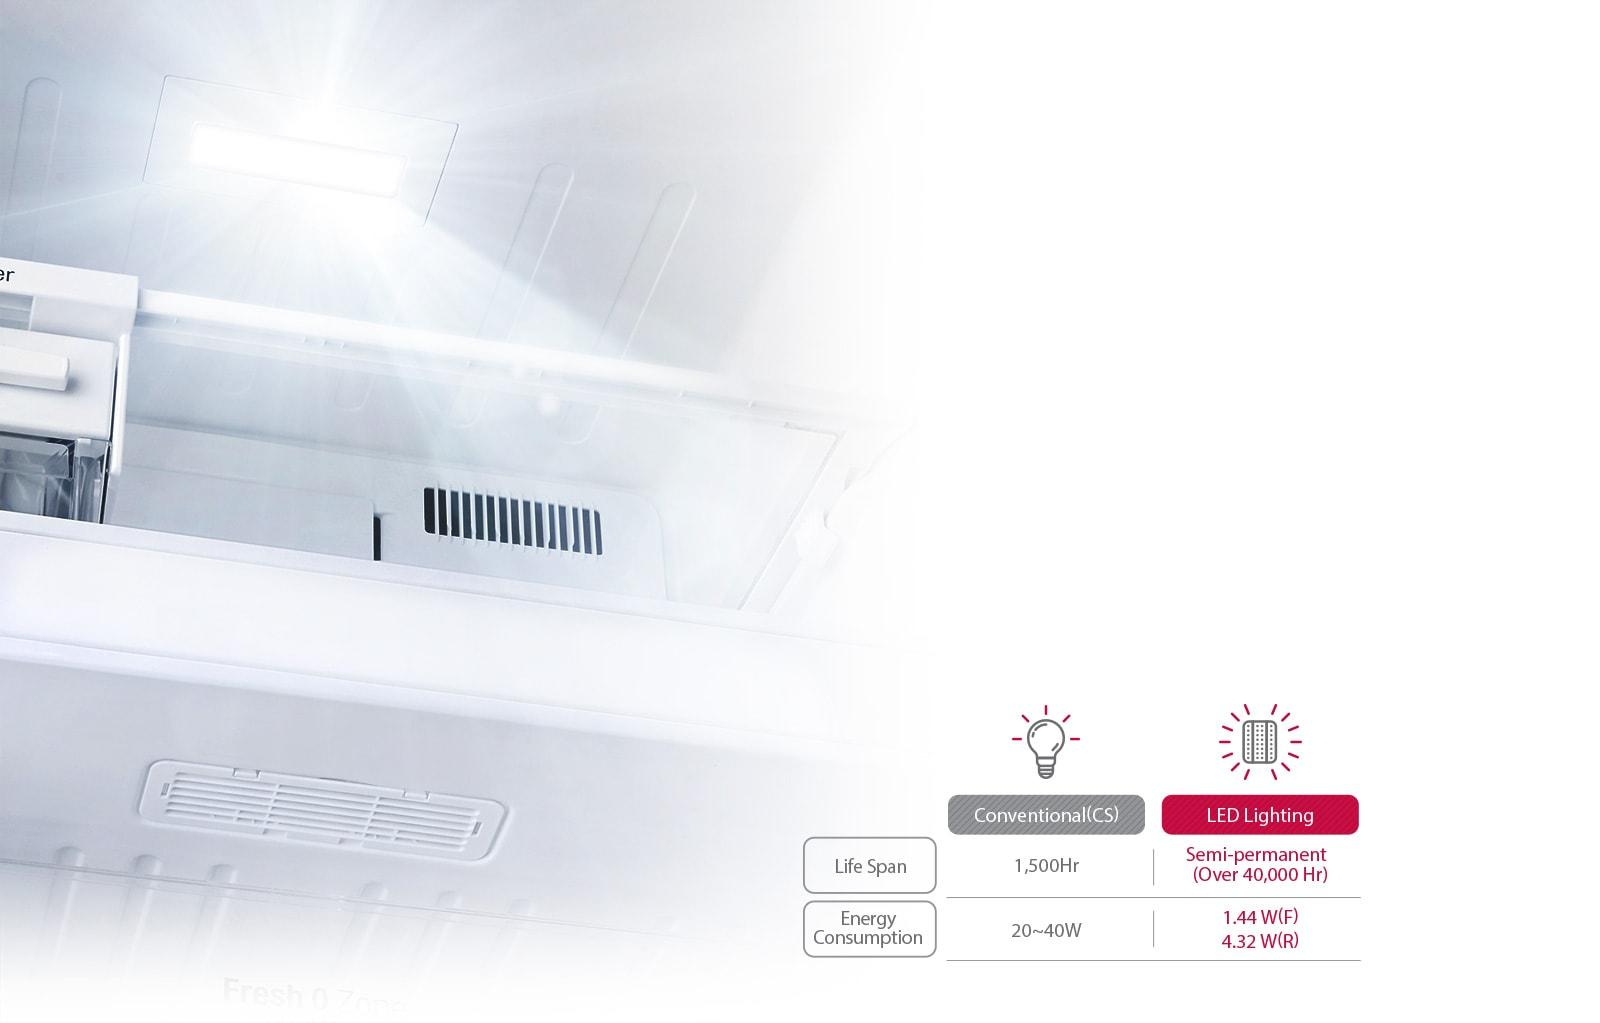 LG GL-T372JES3 335 Ltr LED Lighting